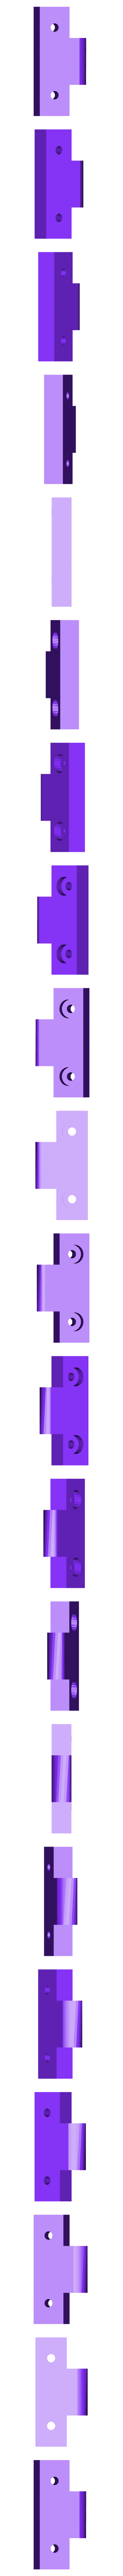 Part1_Protection_camera_Eachine_TX01__TX02_Super_Mini_.stl Download free STL file Polycarbonate protection Camera FPV Super Mini 25mW Eachine TX01 / TX02 200mw • Object to 3D print, Microdure